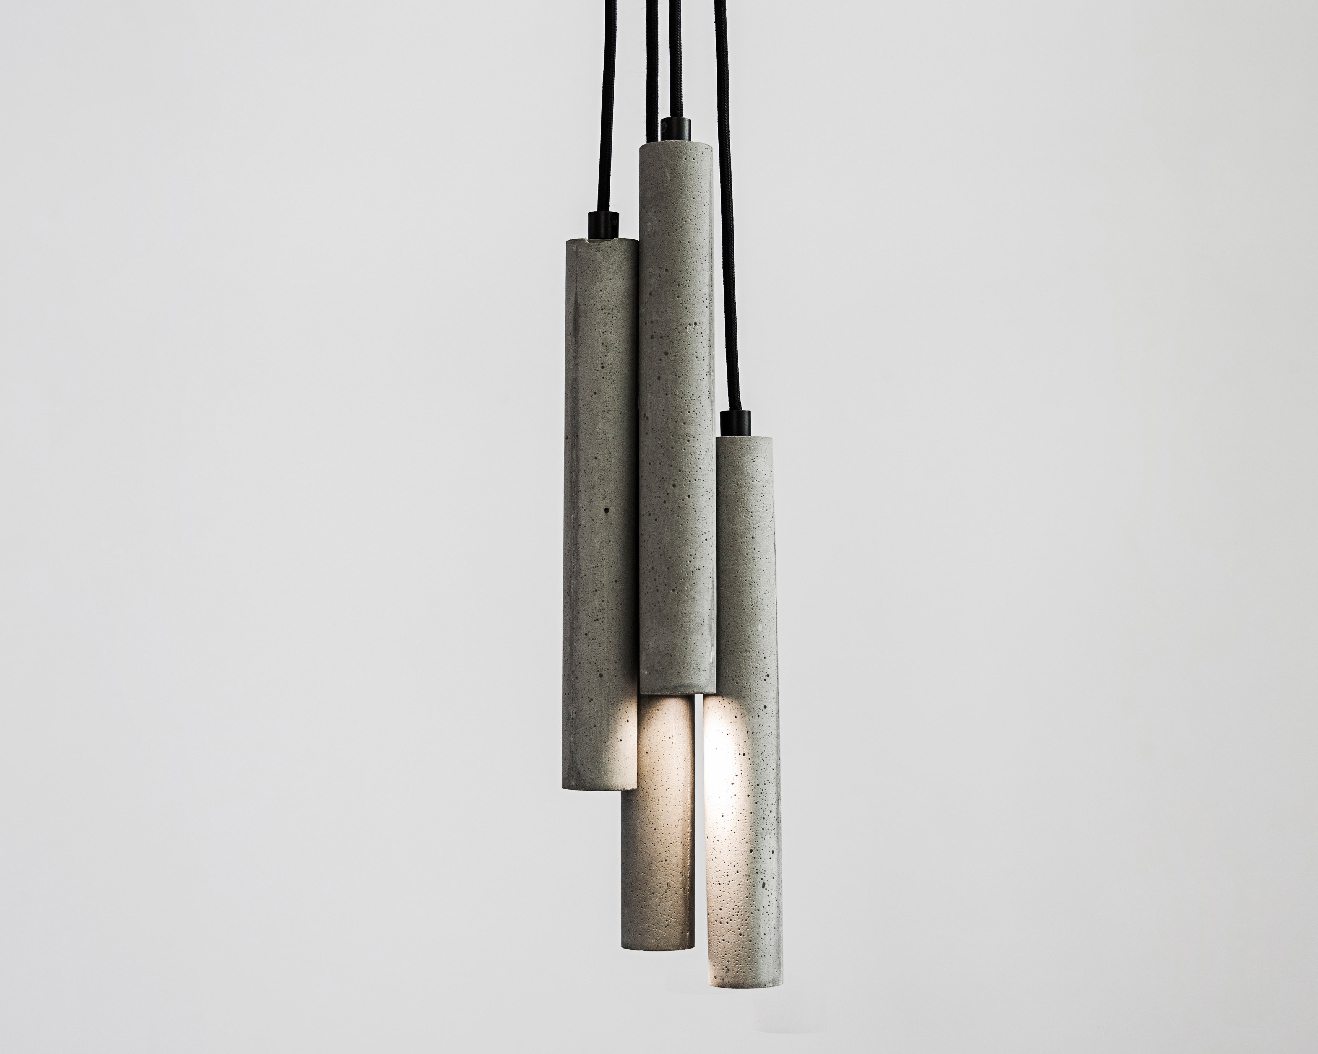 luminaire design with luminaire design excellent luminaire lighting rep ael pearls design. Black Bedroom Furniture Sets. Home Design Ideas